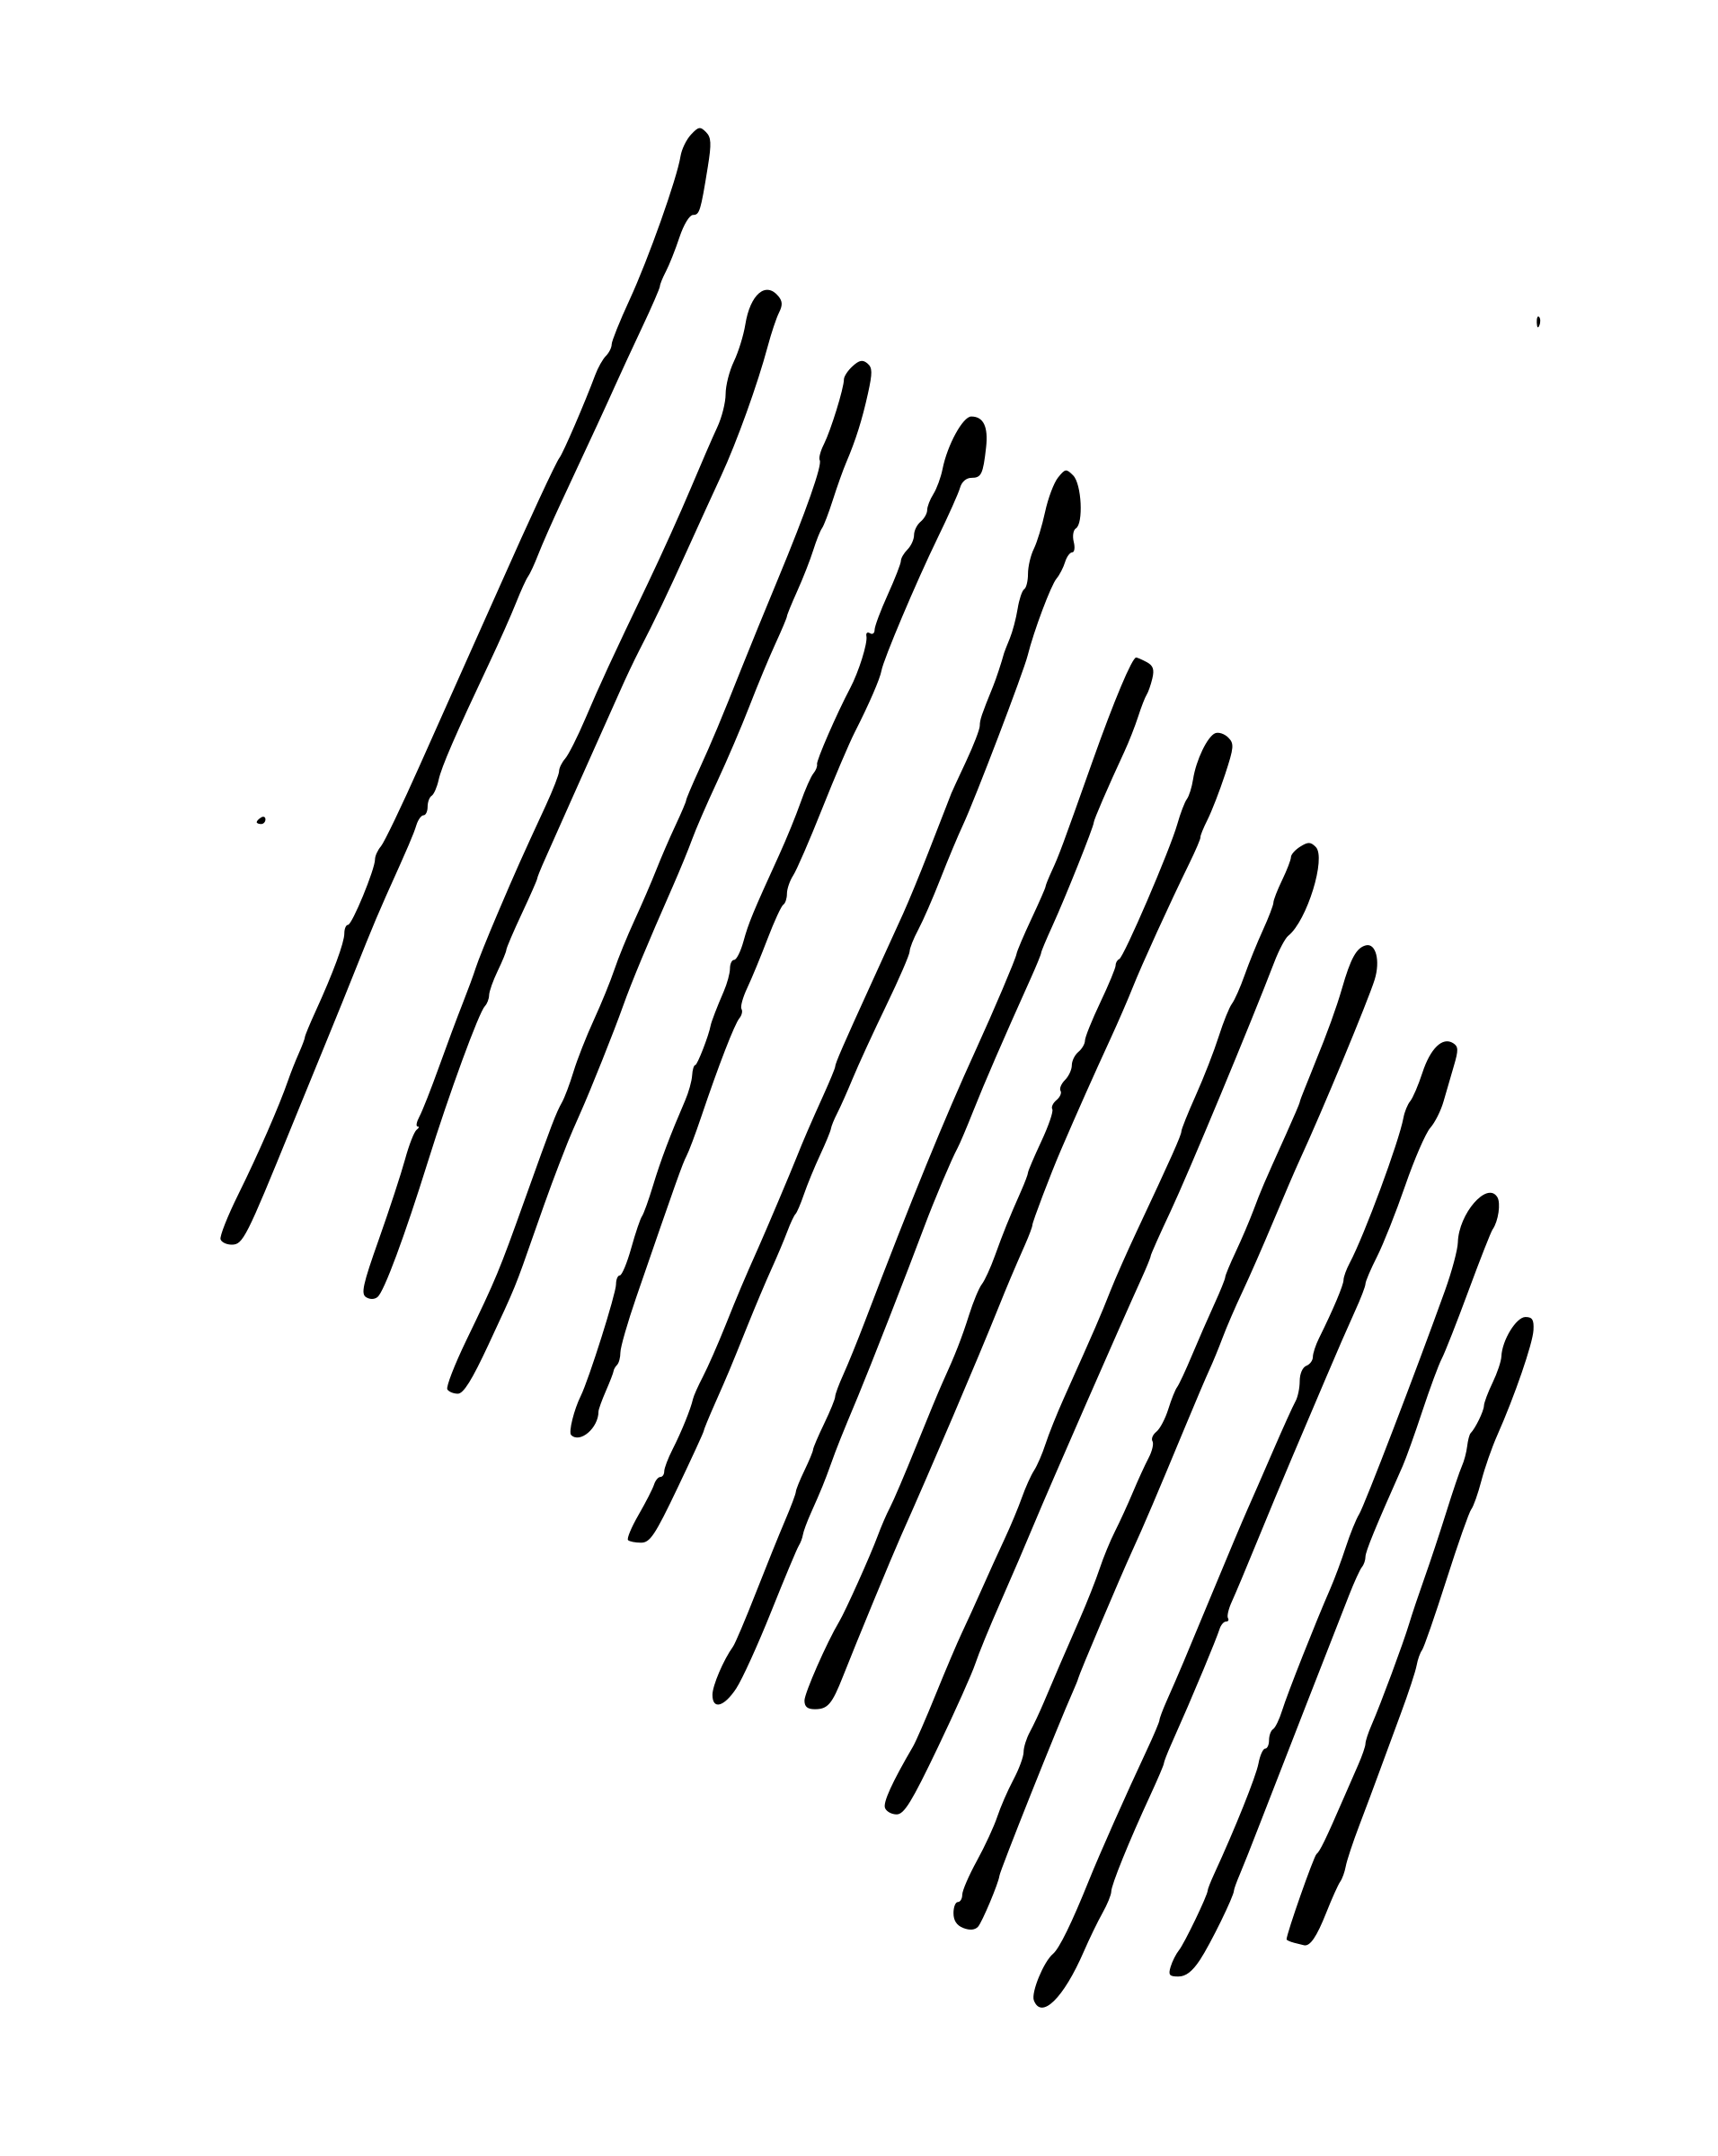 Fast clipart lines. Long perpendicular big image